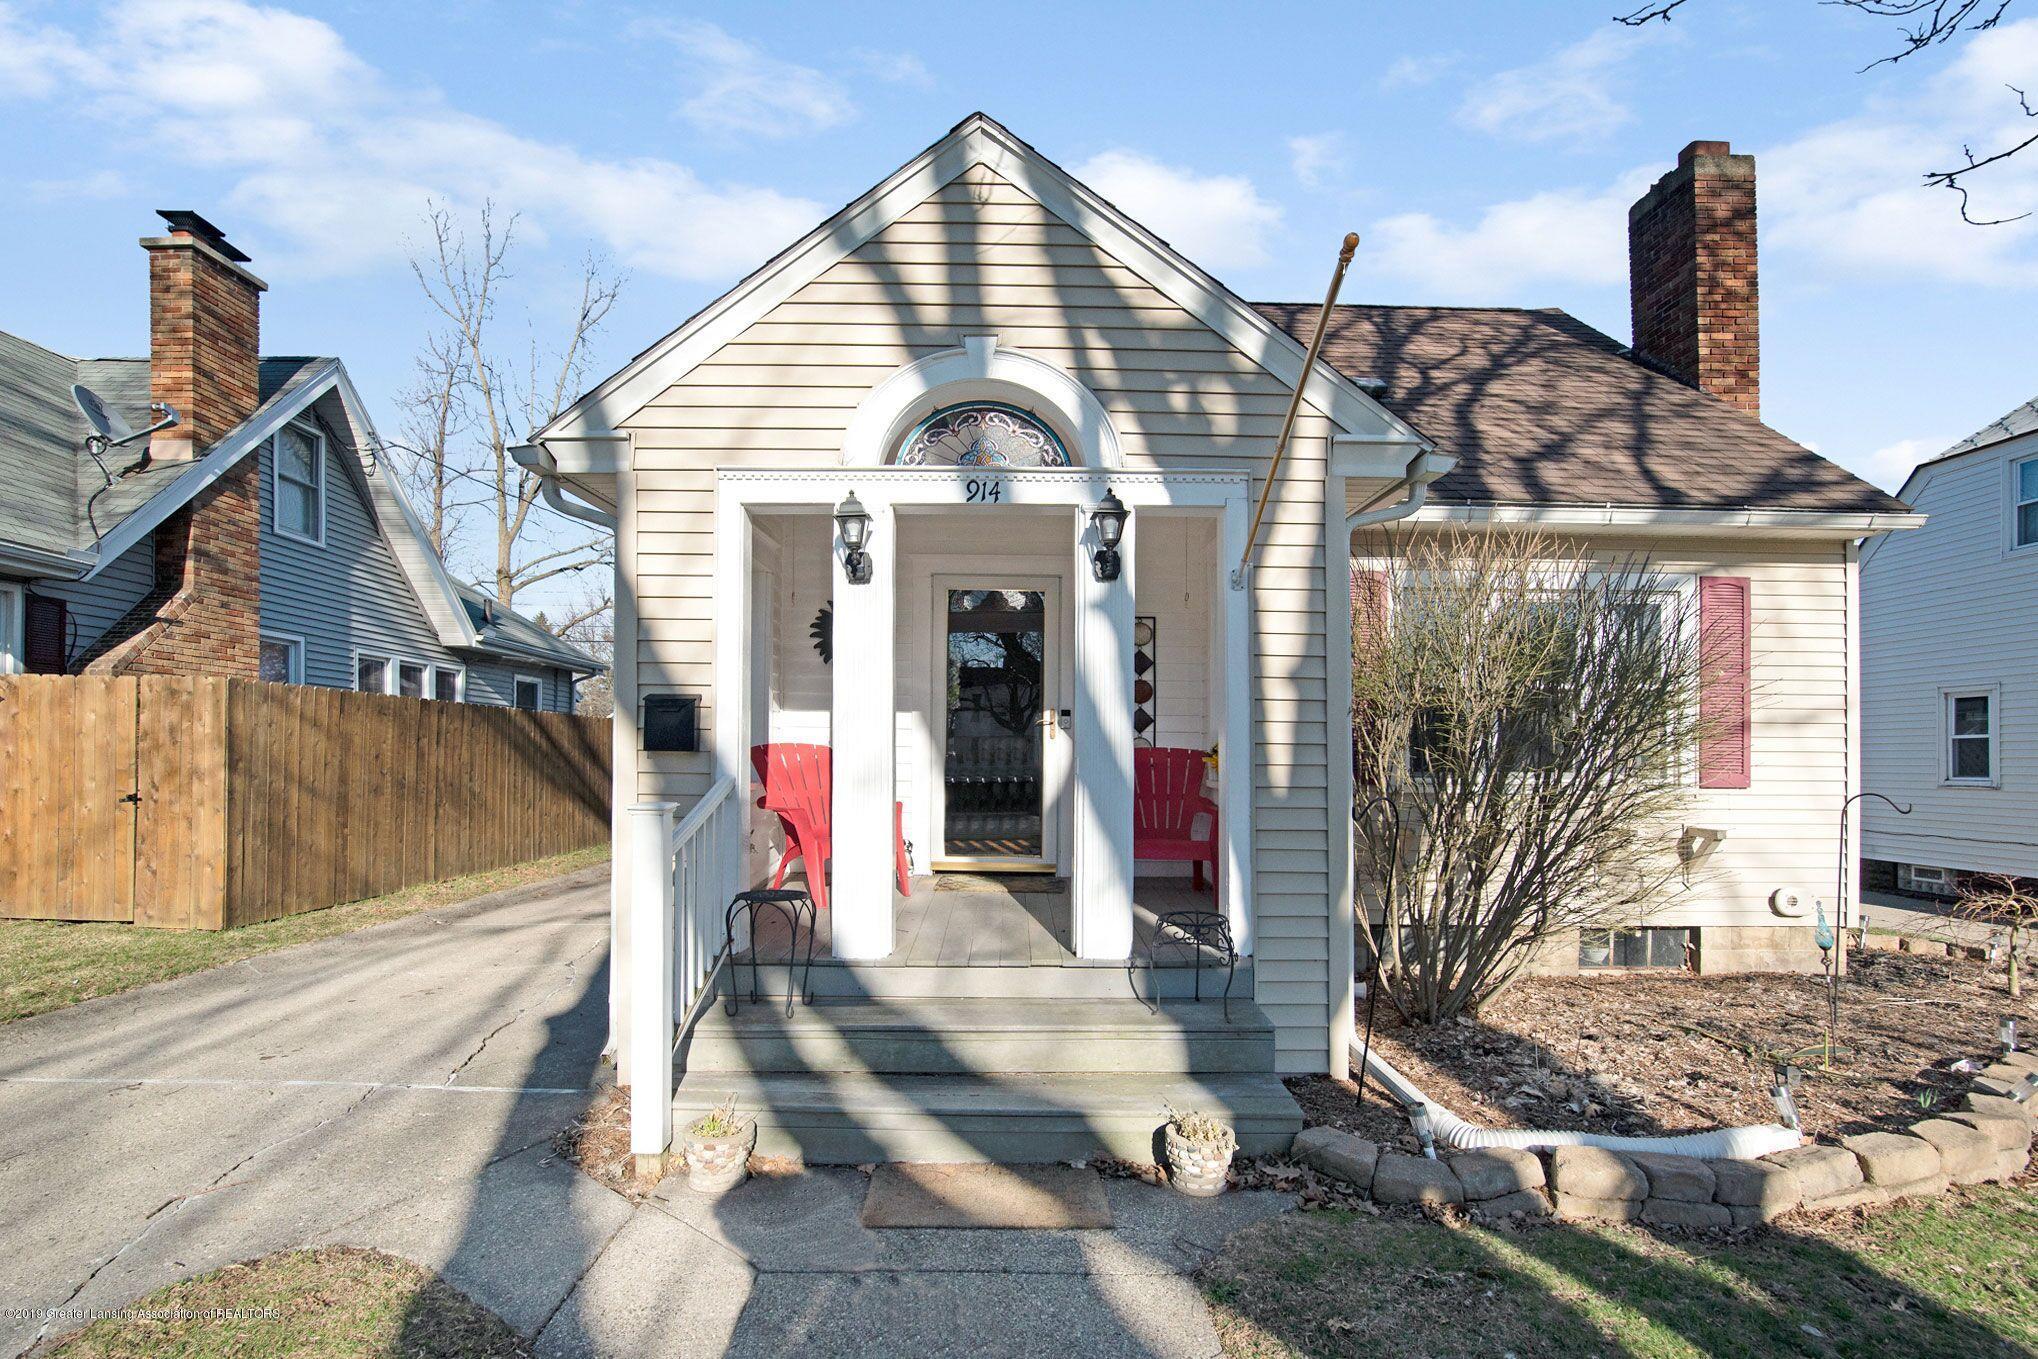 914 N Verlinden Ave - Exterior of Home - 1